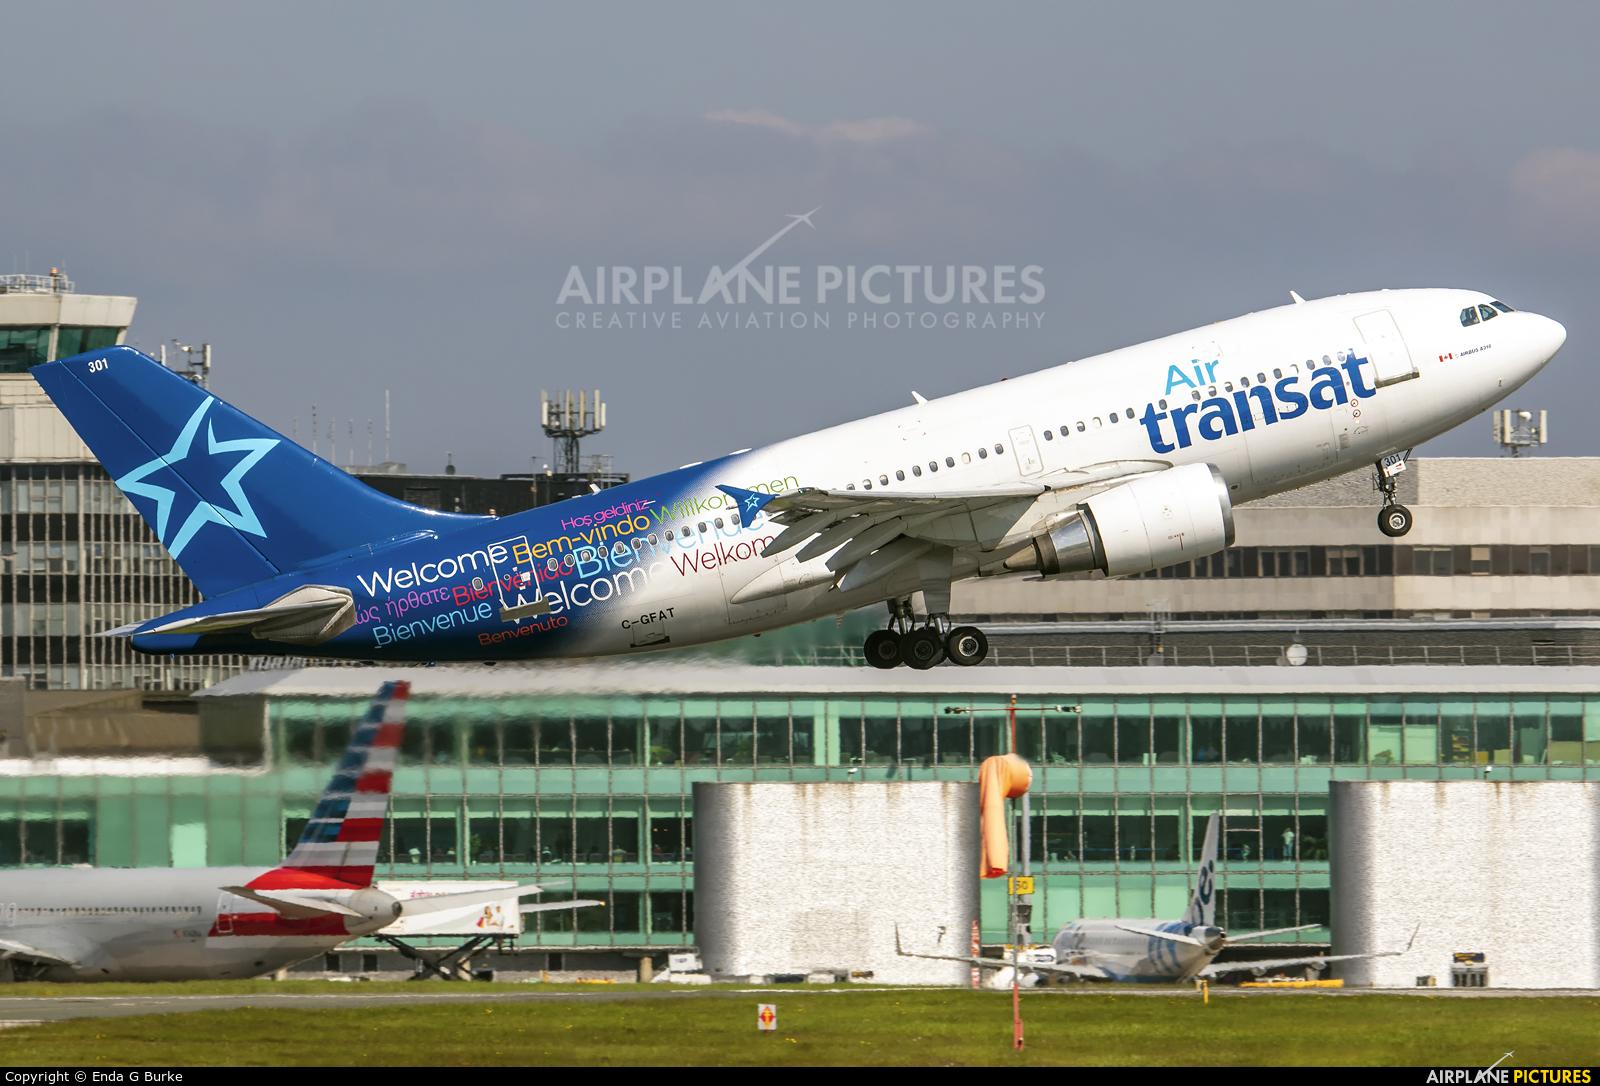 Air Transat C-GFAT aircraft at Manchester